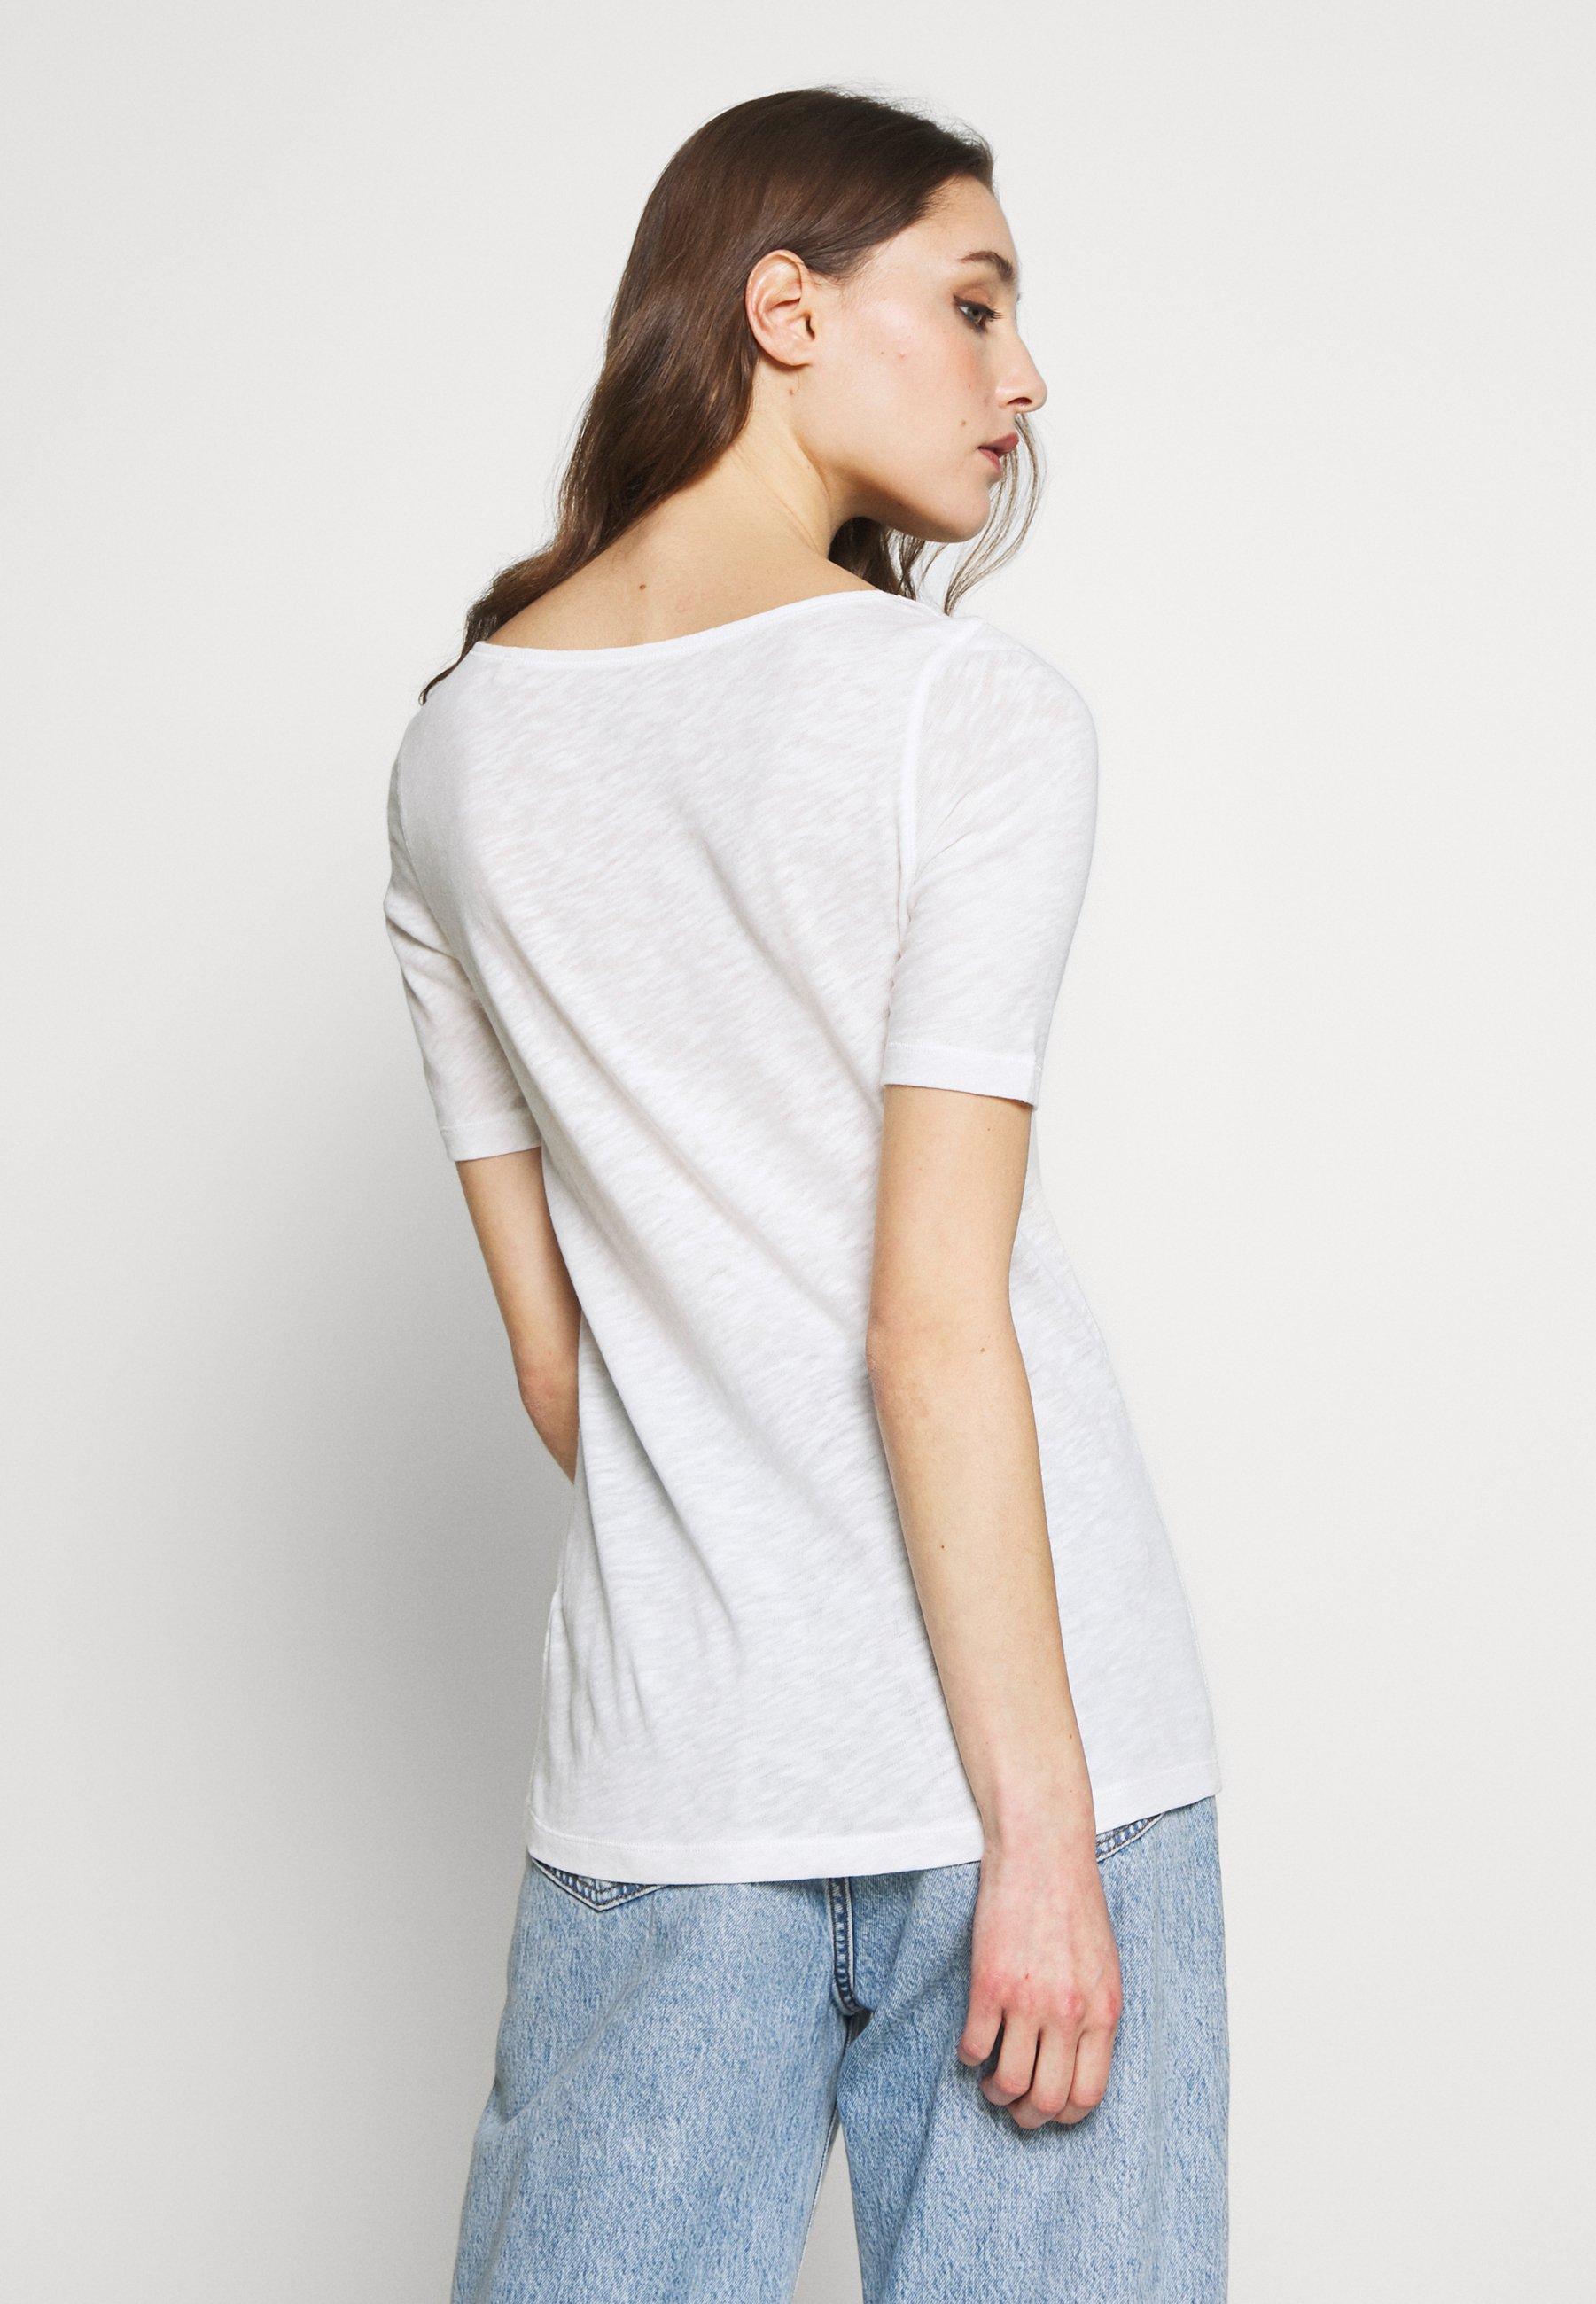 Marc O'Polo T-shirts - soft white